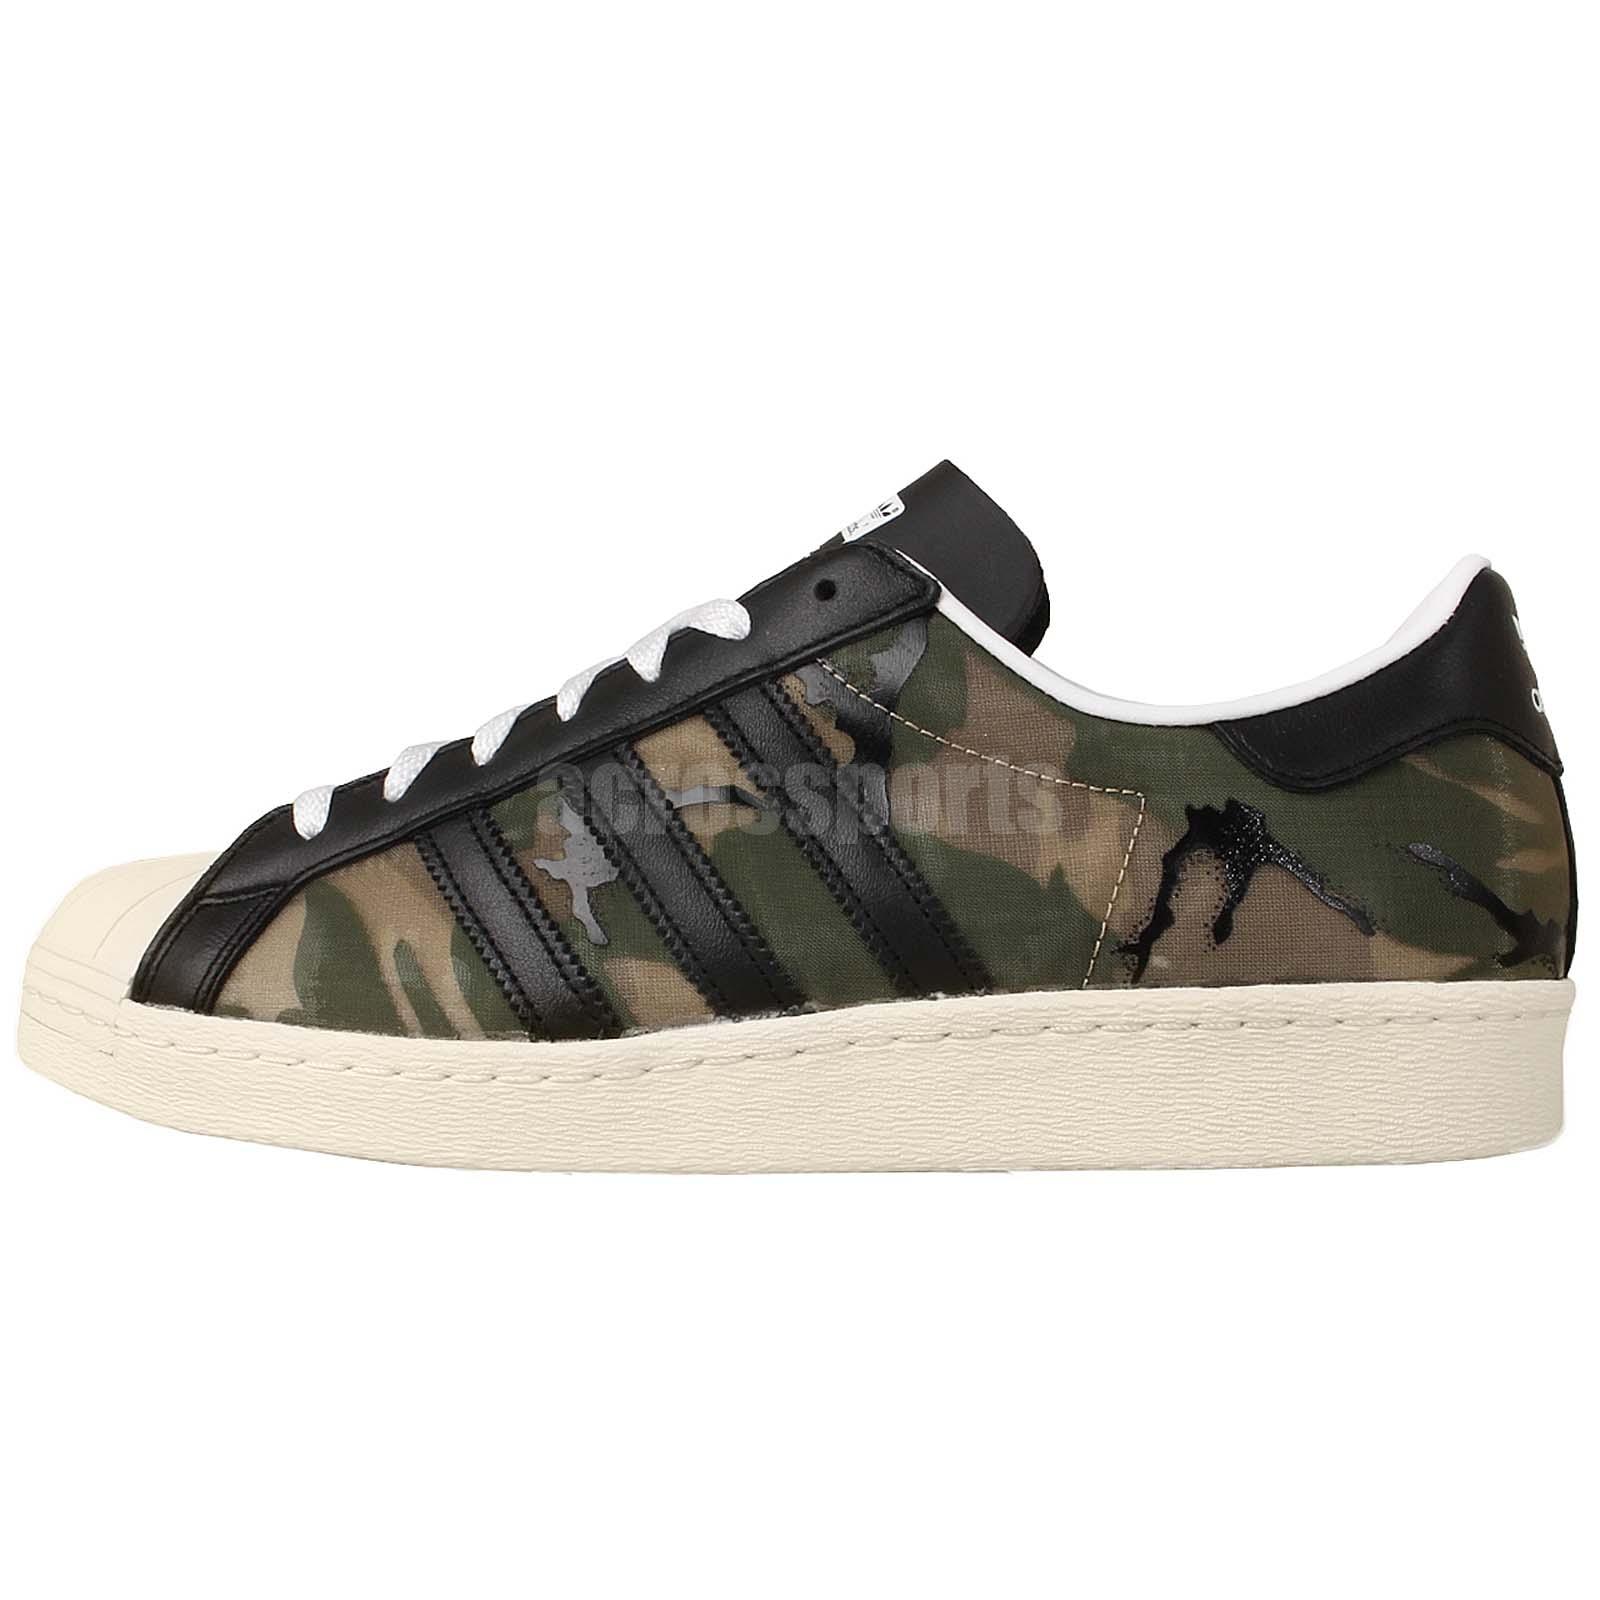 Adidas Superstar vede militare